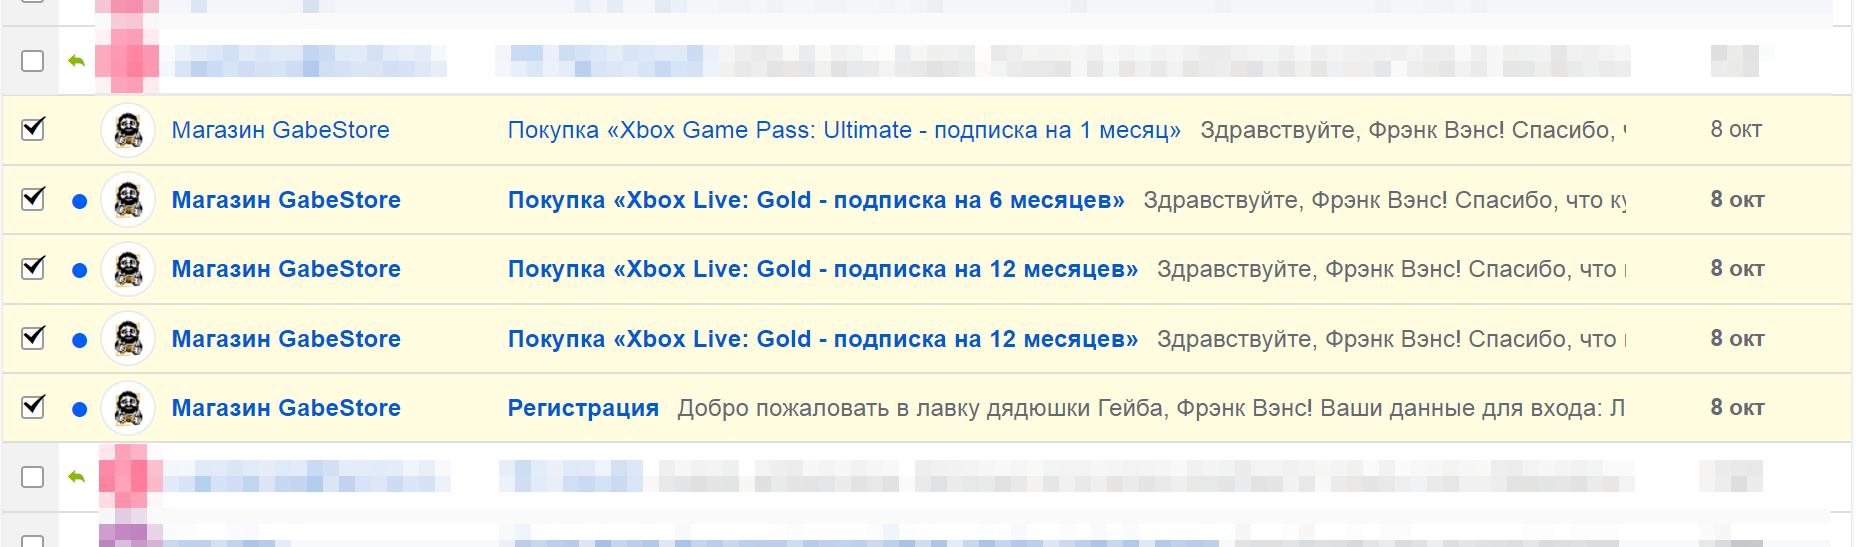 Письма от продавца кодом подписки Xbox Live Gold